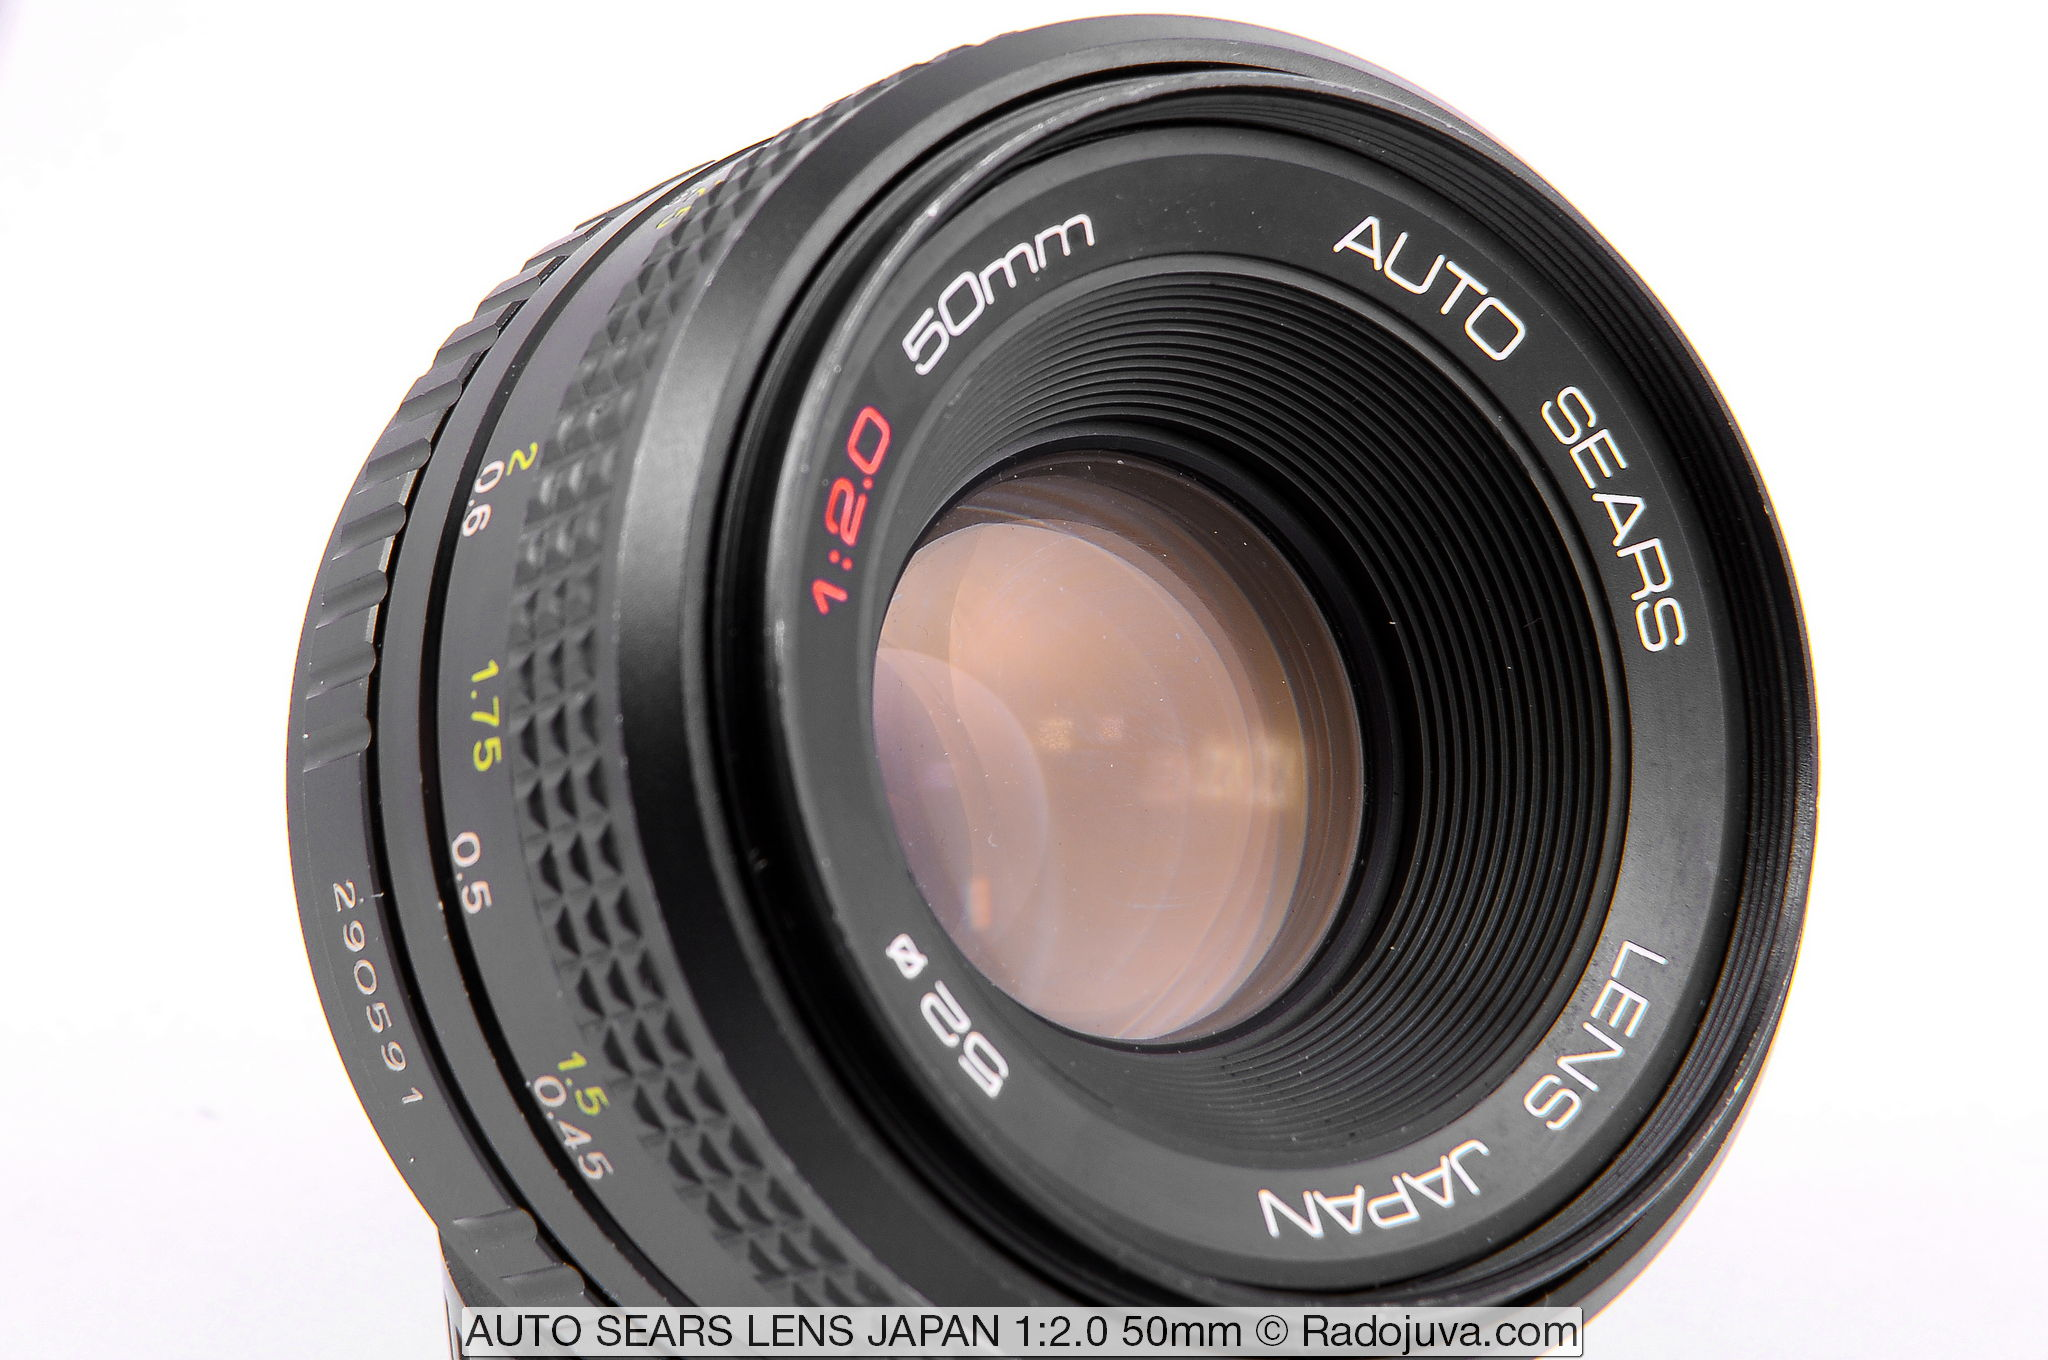 AUTO SEARS LENS JAPAN 1:2.0 50mm